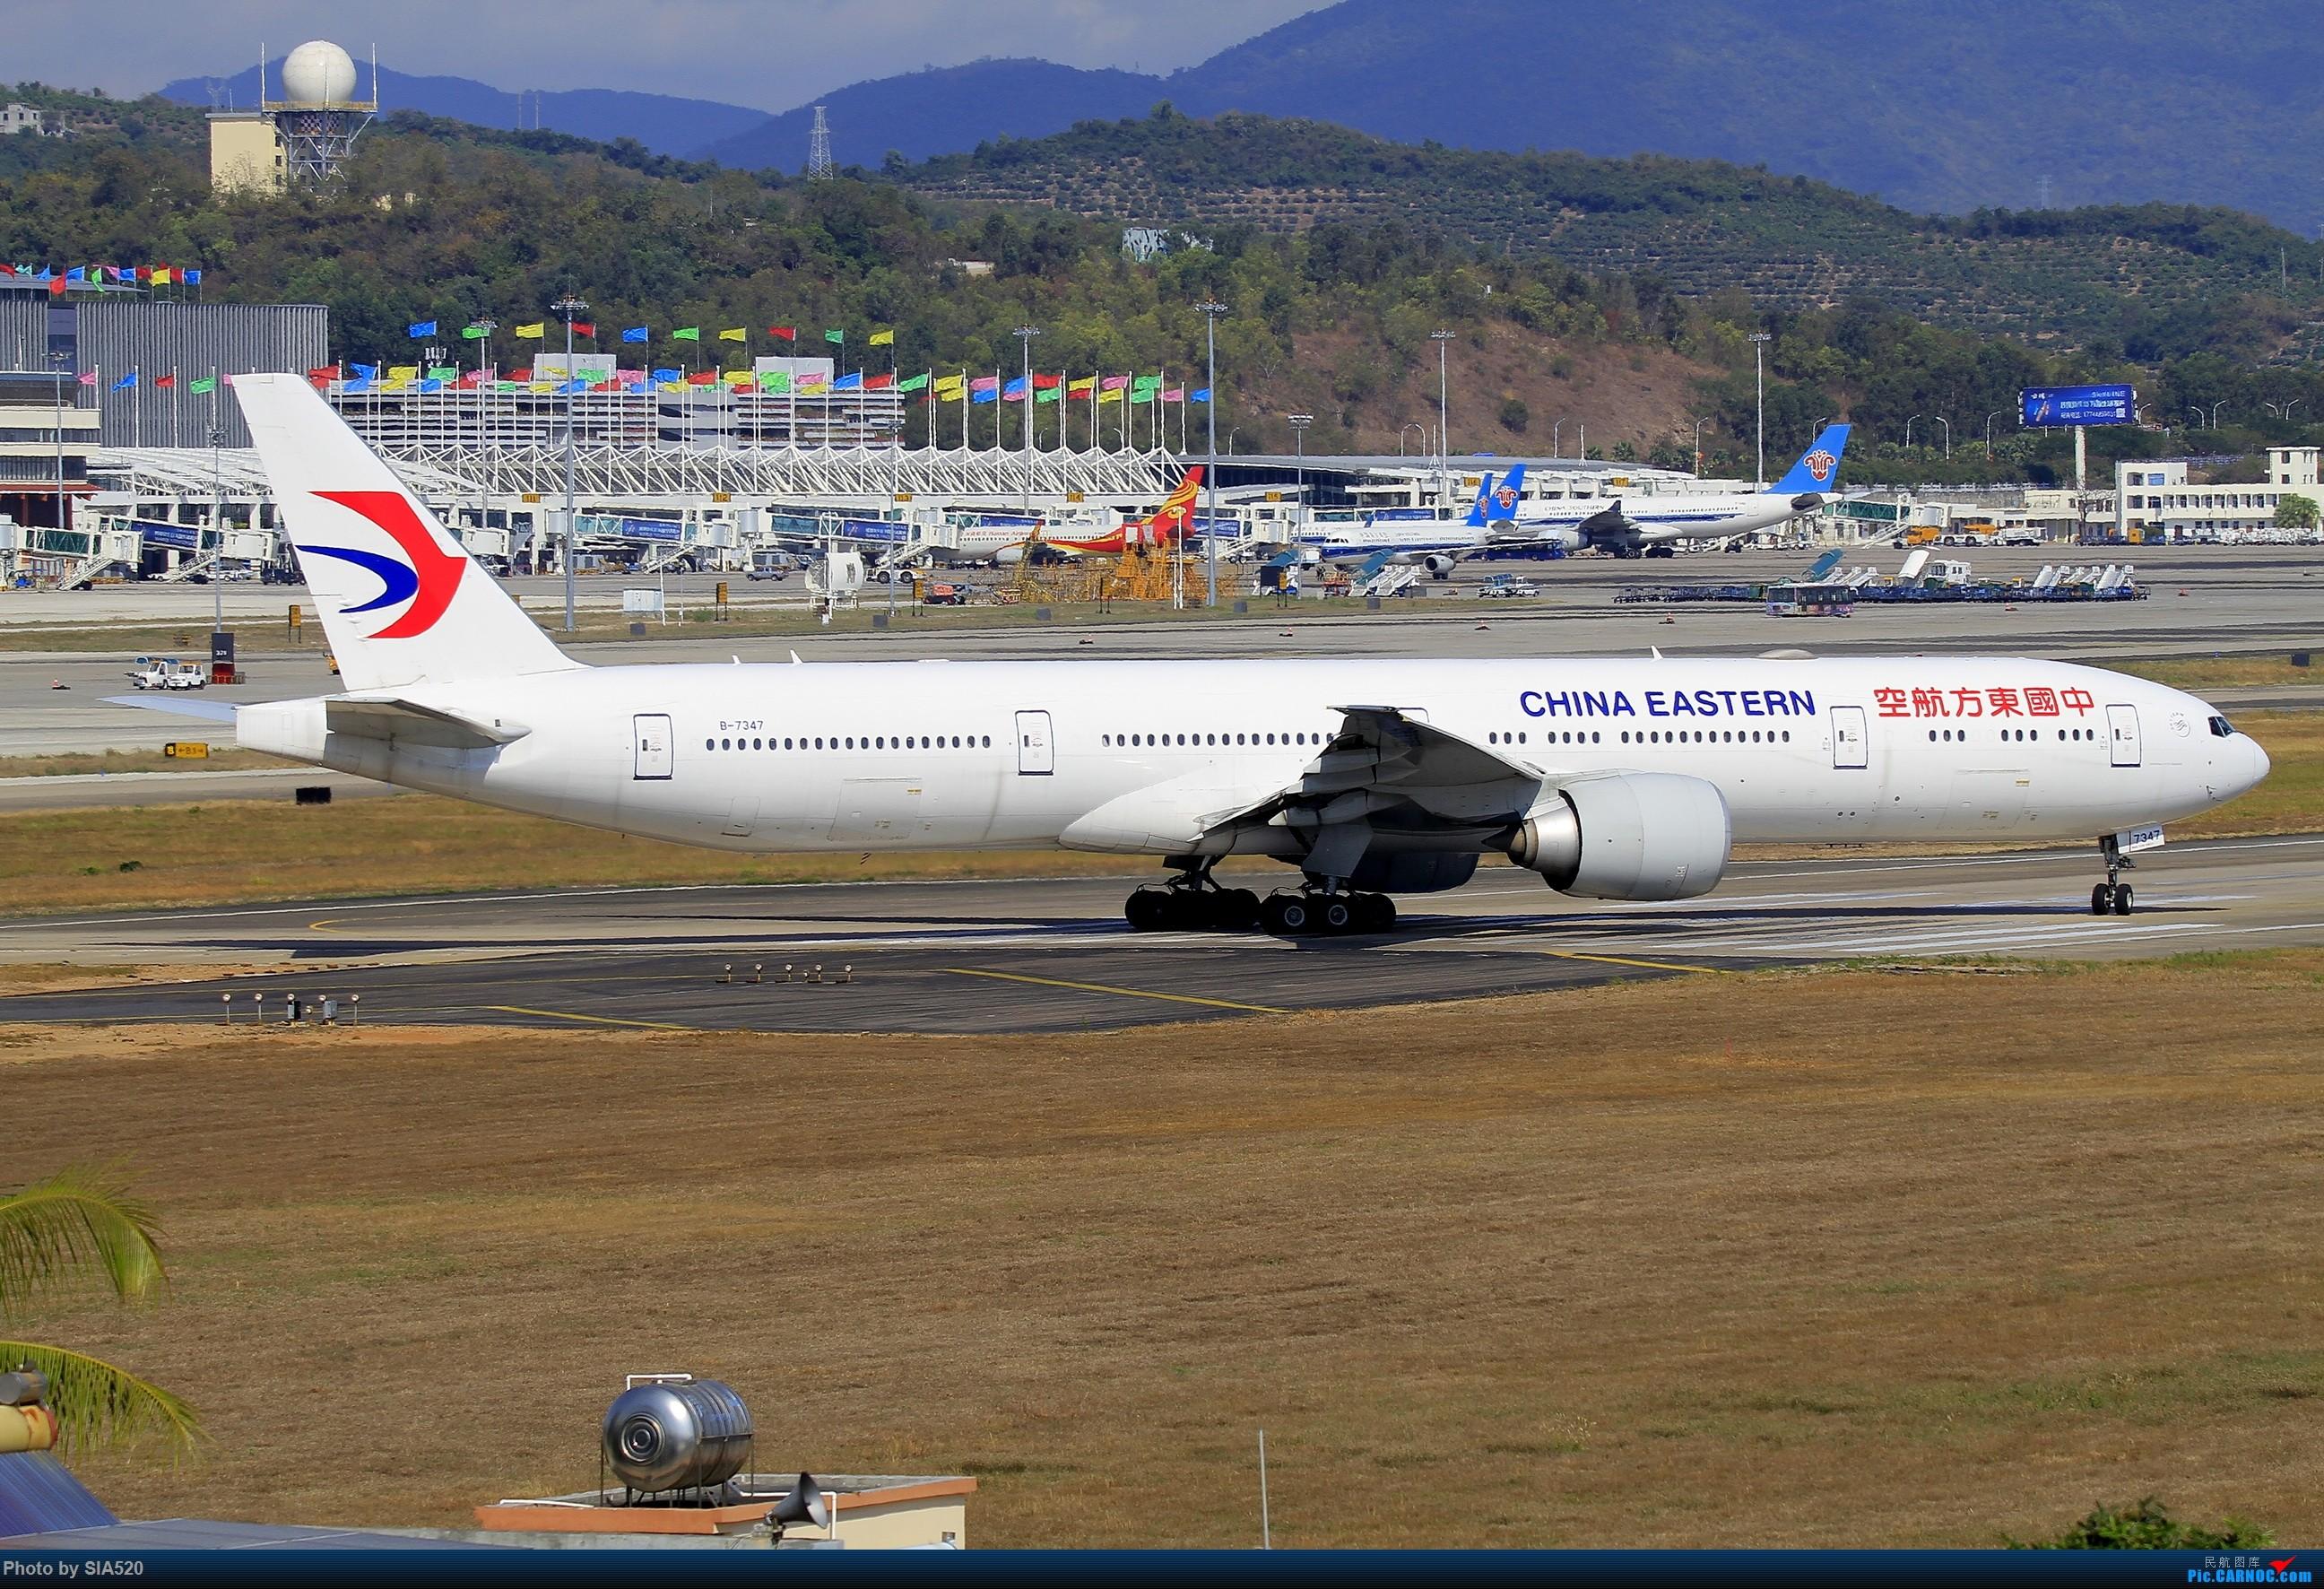 Re:[原创]北京人儿在三亚—600mm解锁凤凰 BOEING 777-300ER B-7347 中国三亚凤凰国际机场